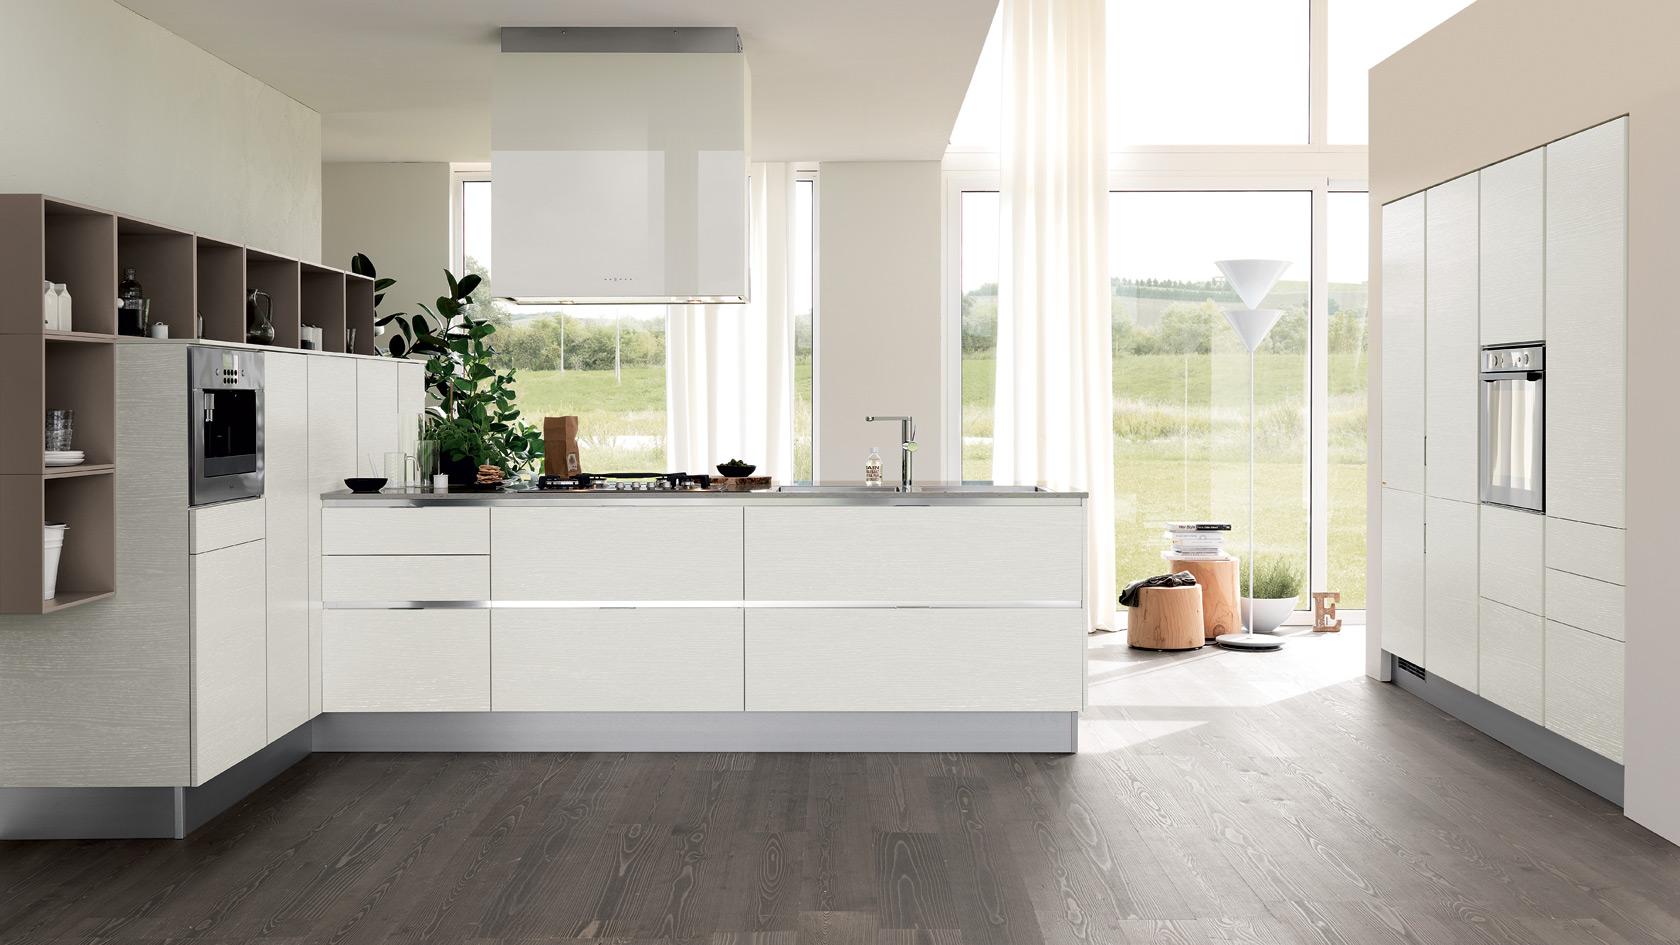 cucina-scavolini-mood-arredamenti-modena-2 - Arredamenti Casarini ...